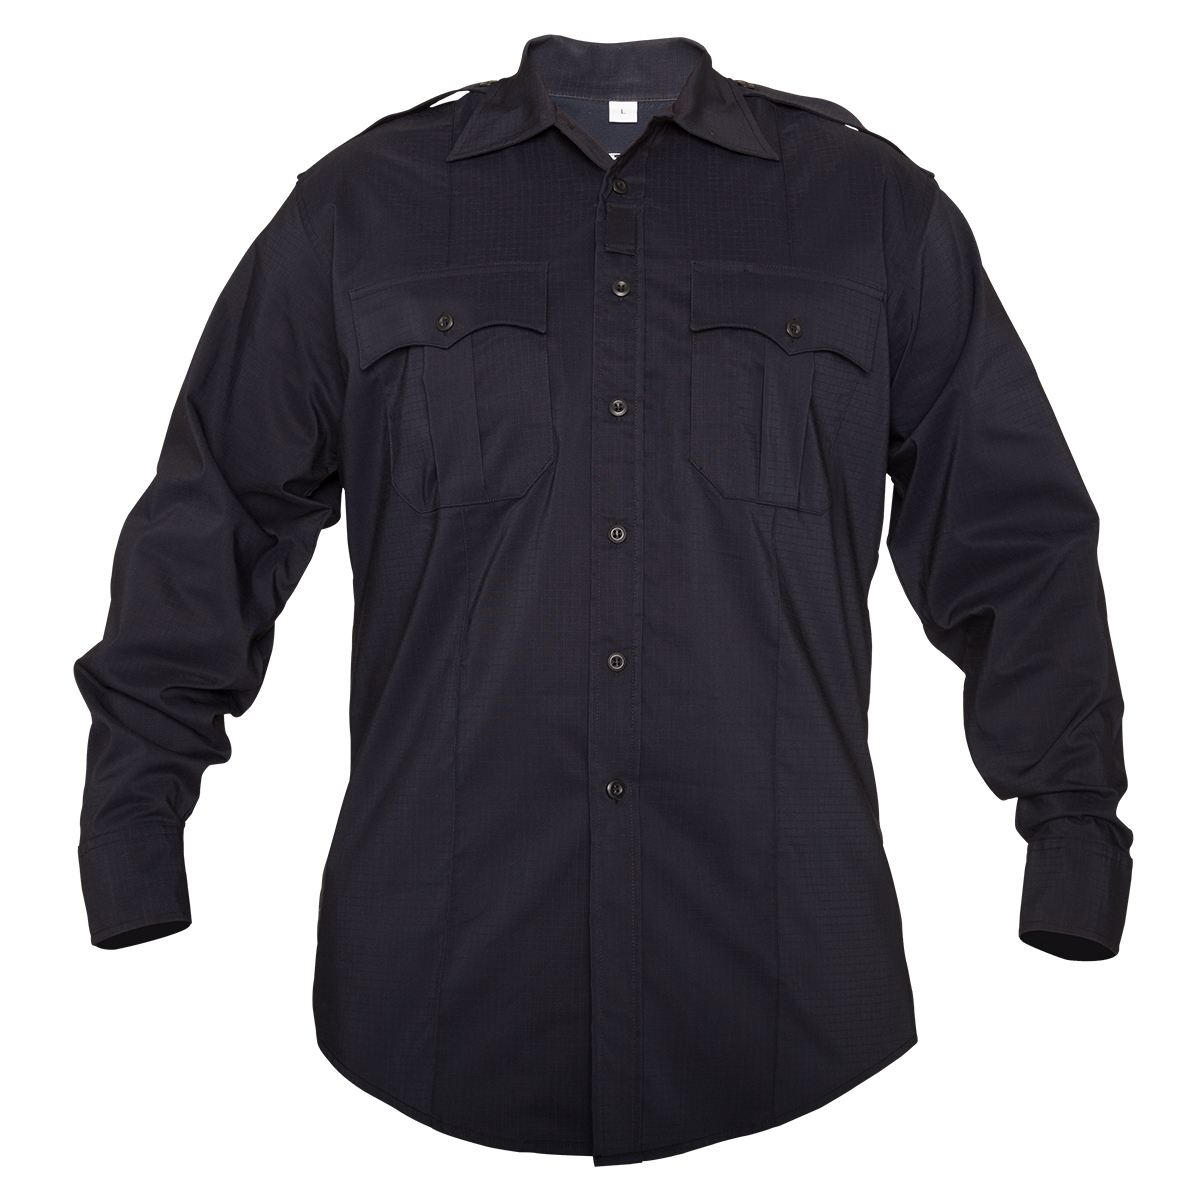 Reflex Long Sleeve Shirt-Womens-Elbeco